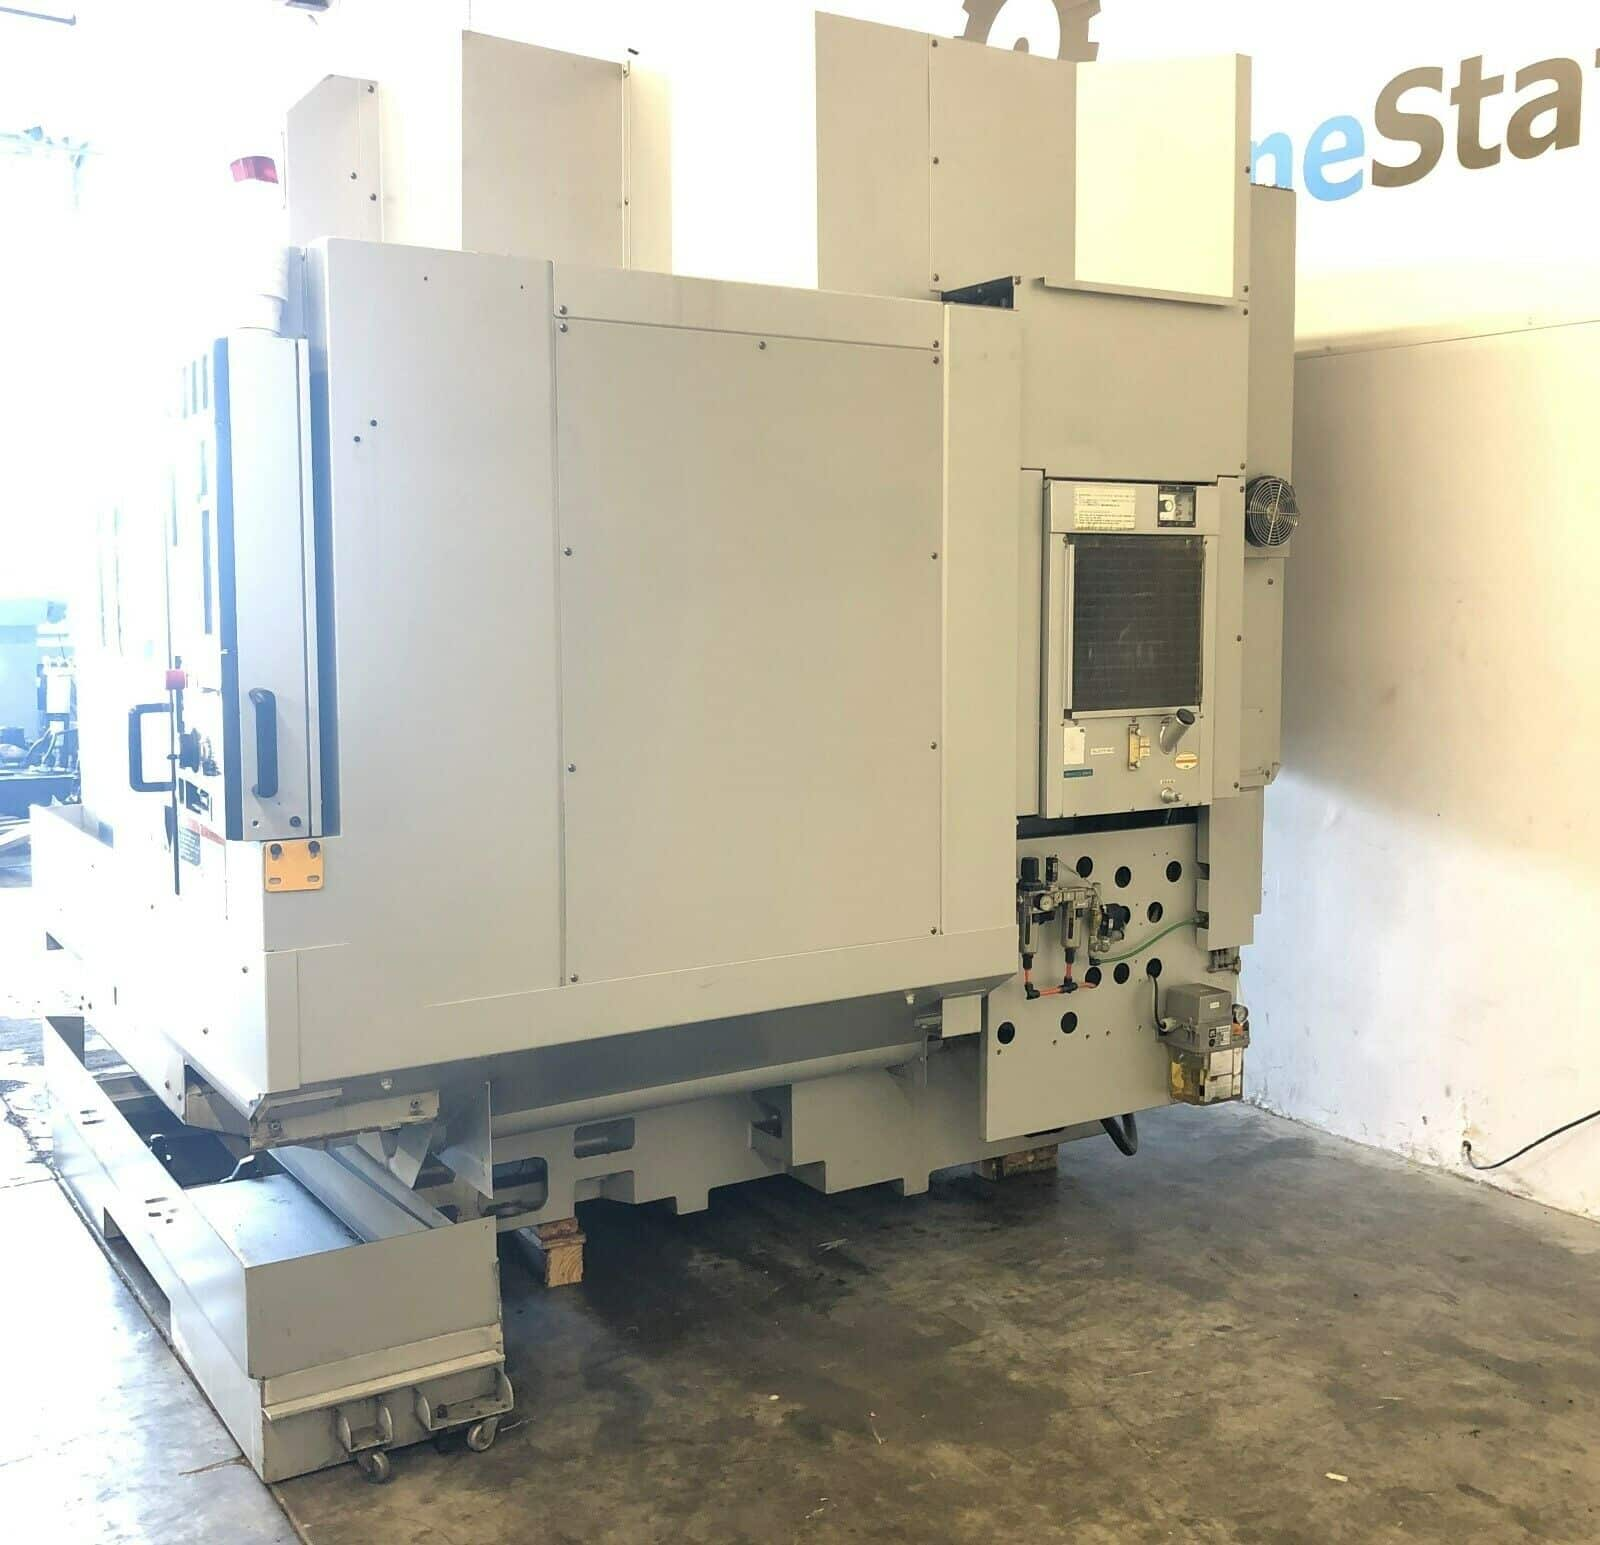 Mori seiki nv 5000 cnc vertical machining center machinestation - Vertical align div ...